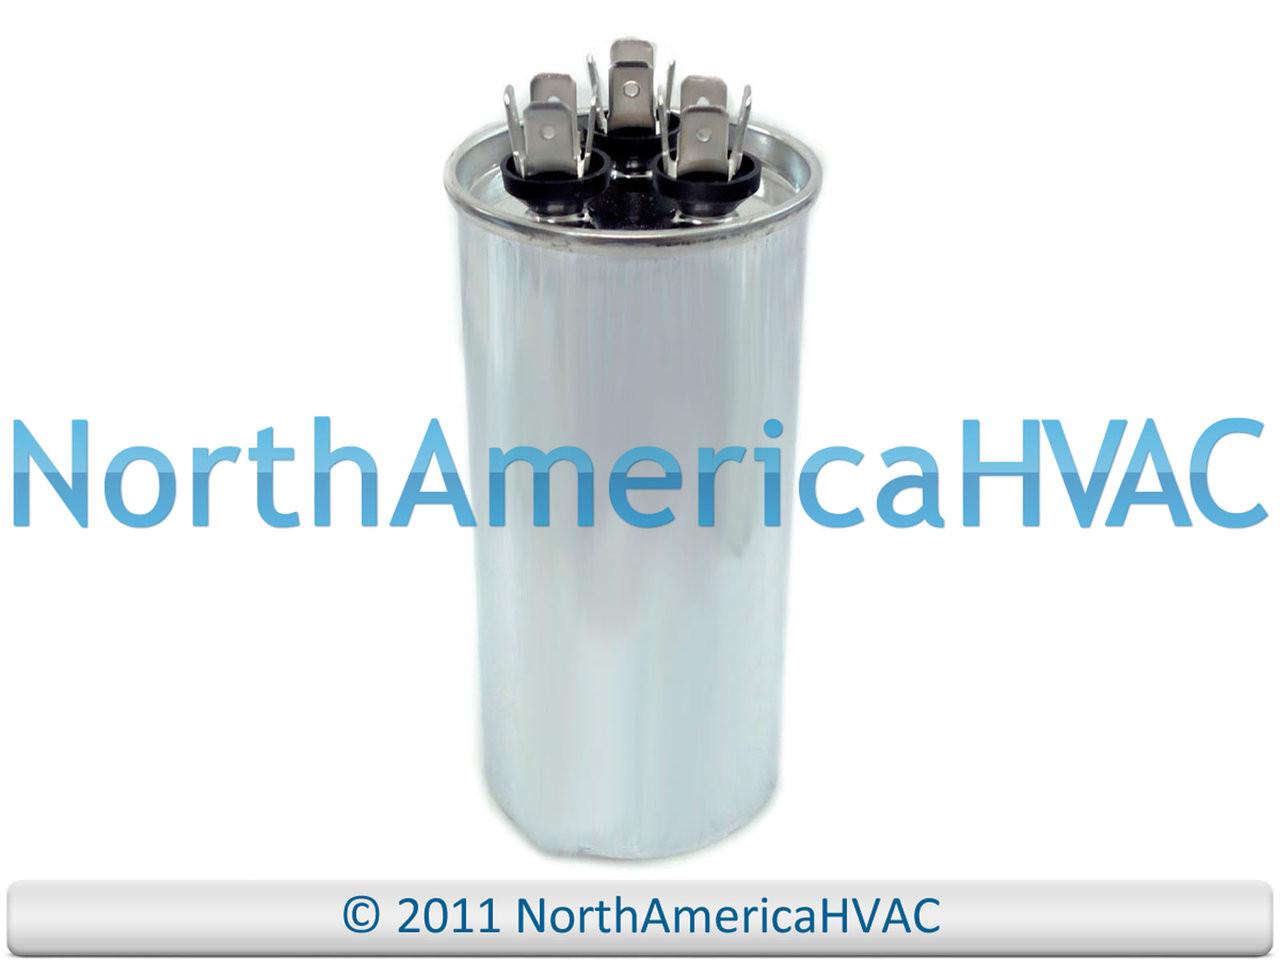 25 uf MFD 370//440 Volt VAC ClimaTek Round Capacitor fits Jard # 12715